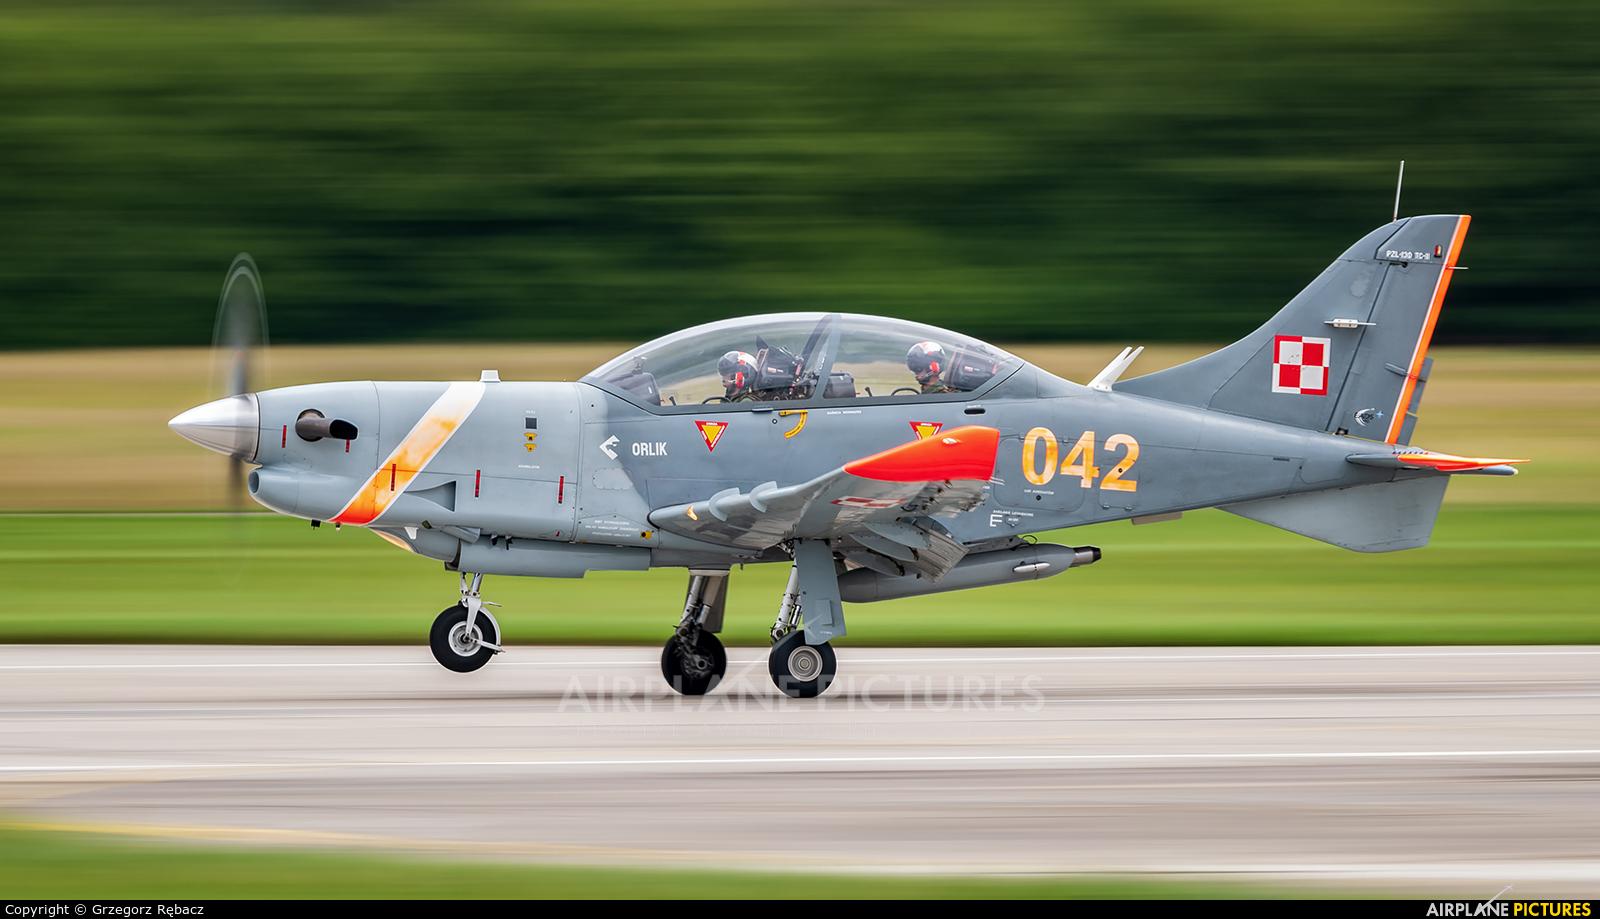 "Poland - Air Force ""Orlik Acrobatic Group"" 042 aircraft at Gdynia- Babie Doły (Oksywie)"